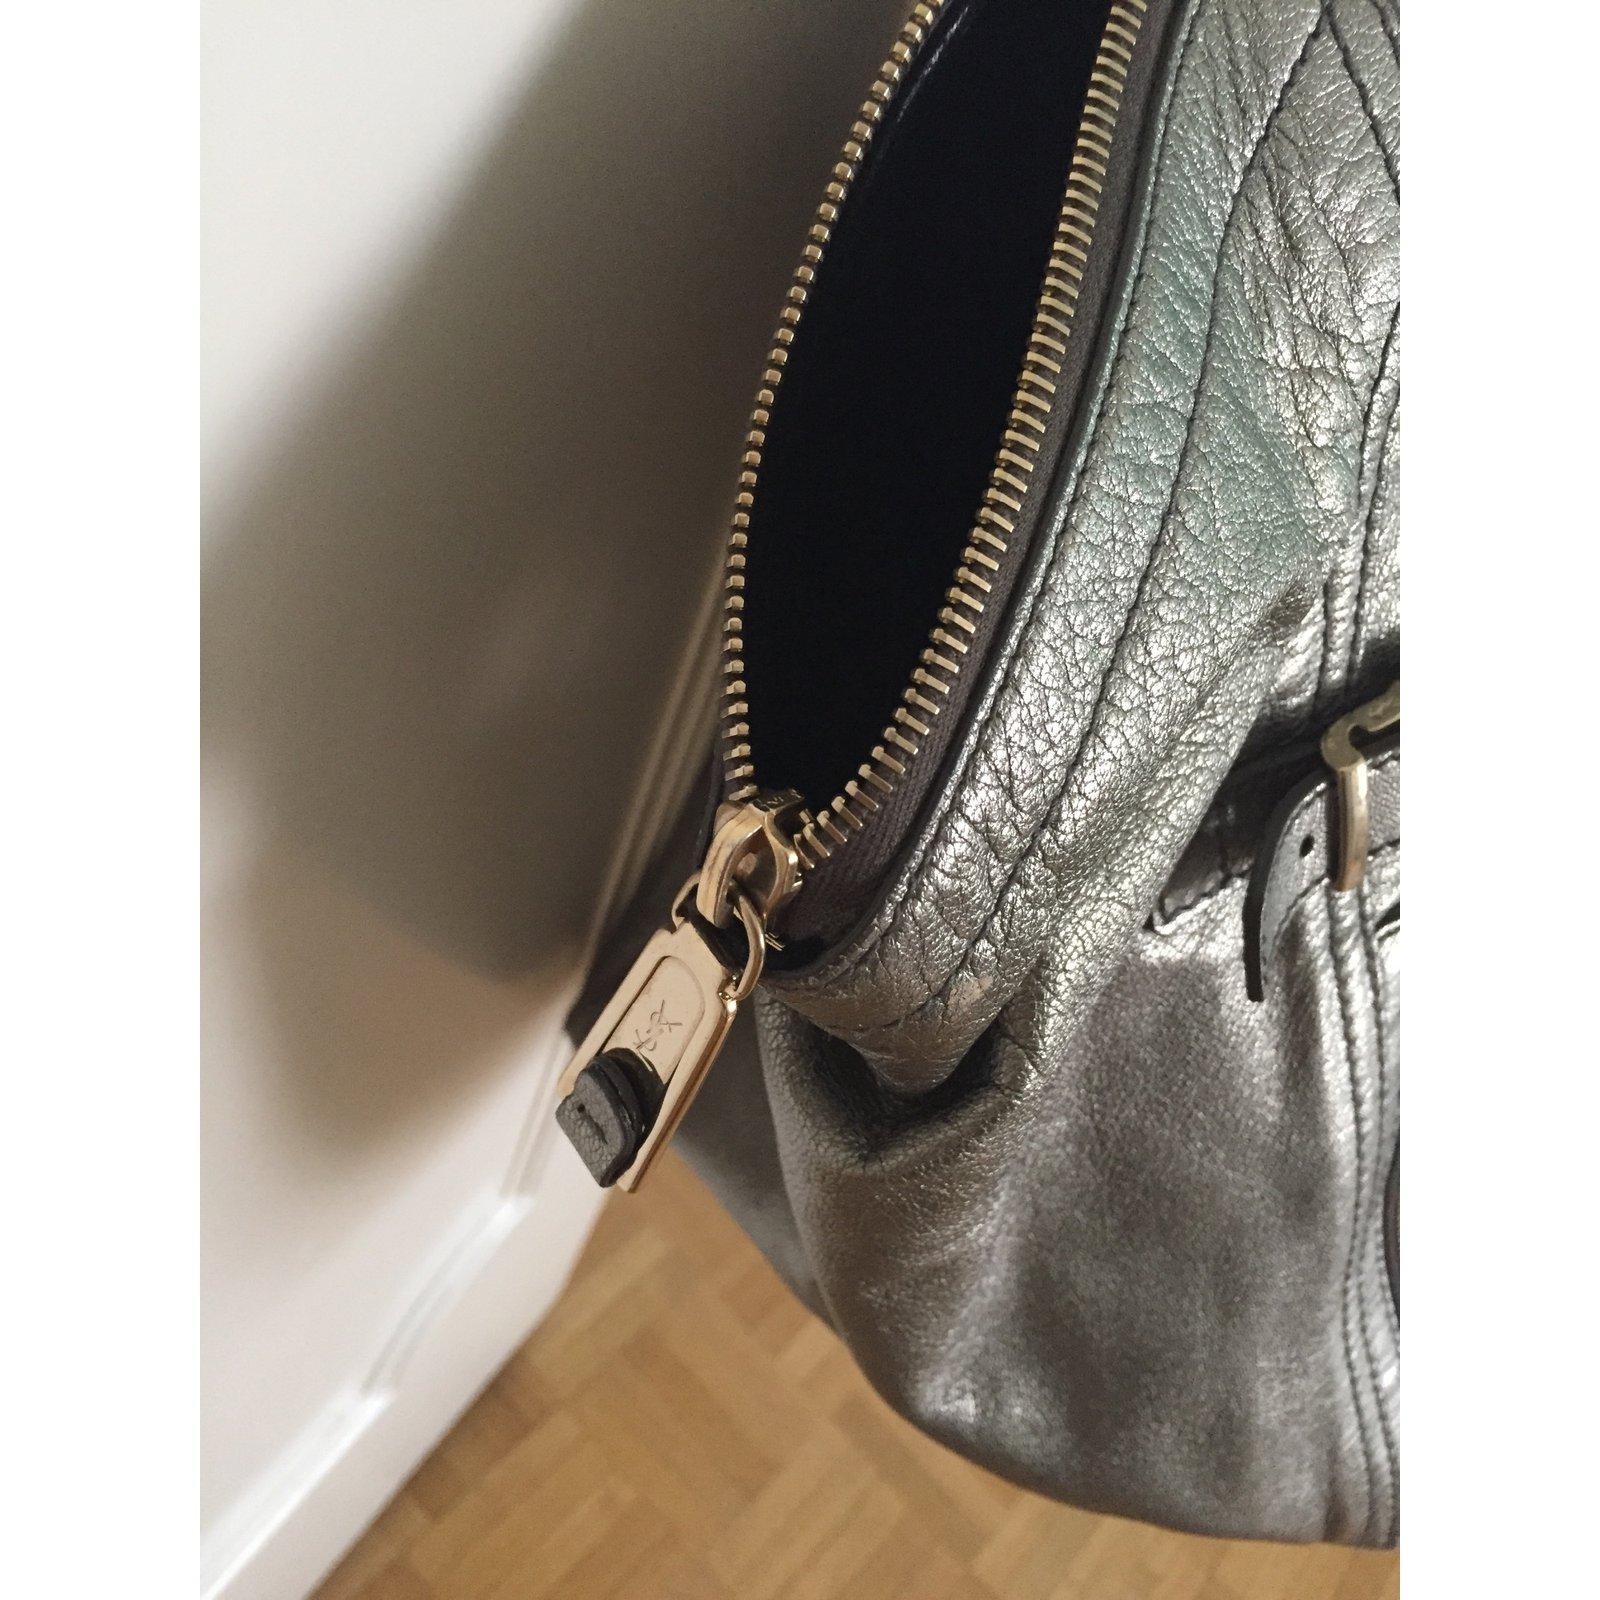 5905cf2123 Facebook · Pin This. Yves Saint Laurent Handbag Handbags Leather Silvery ref .41320